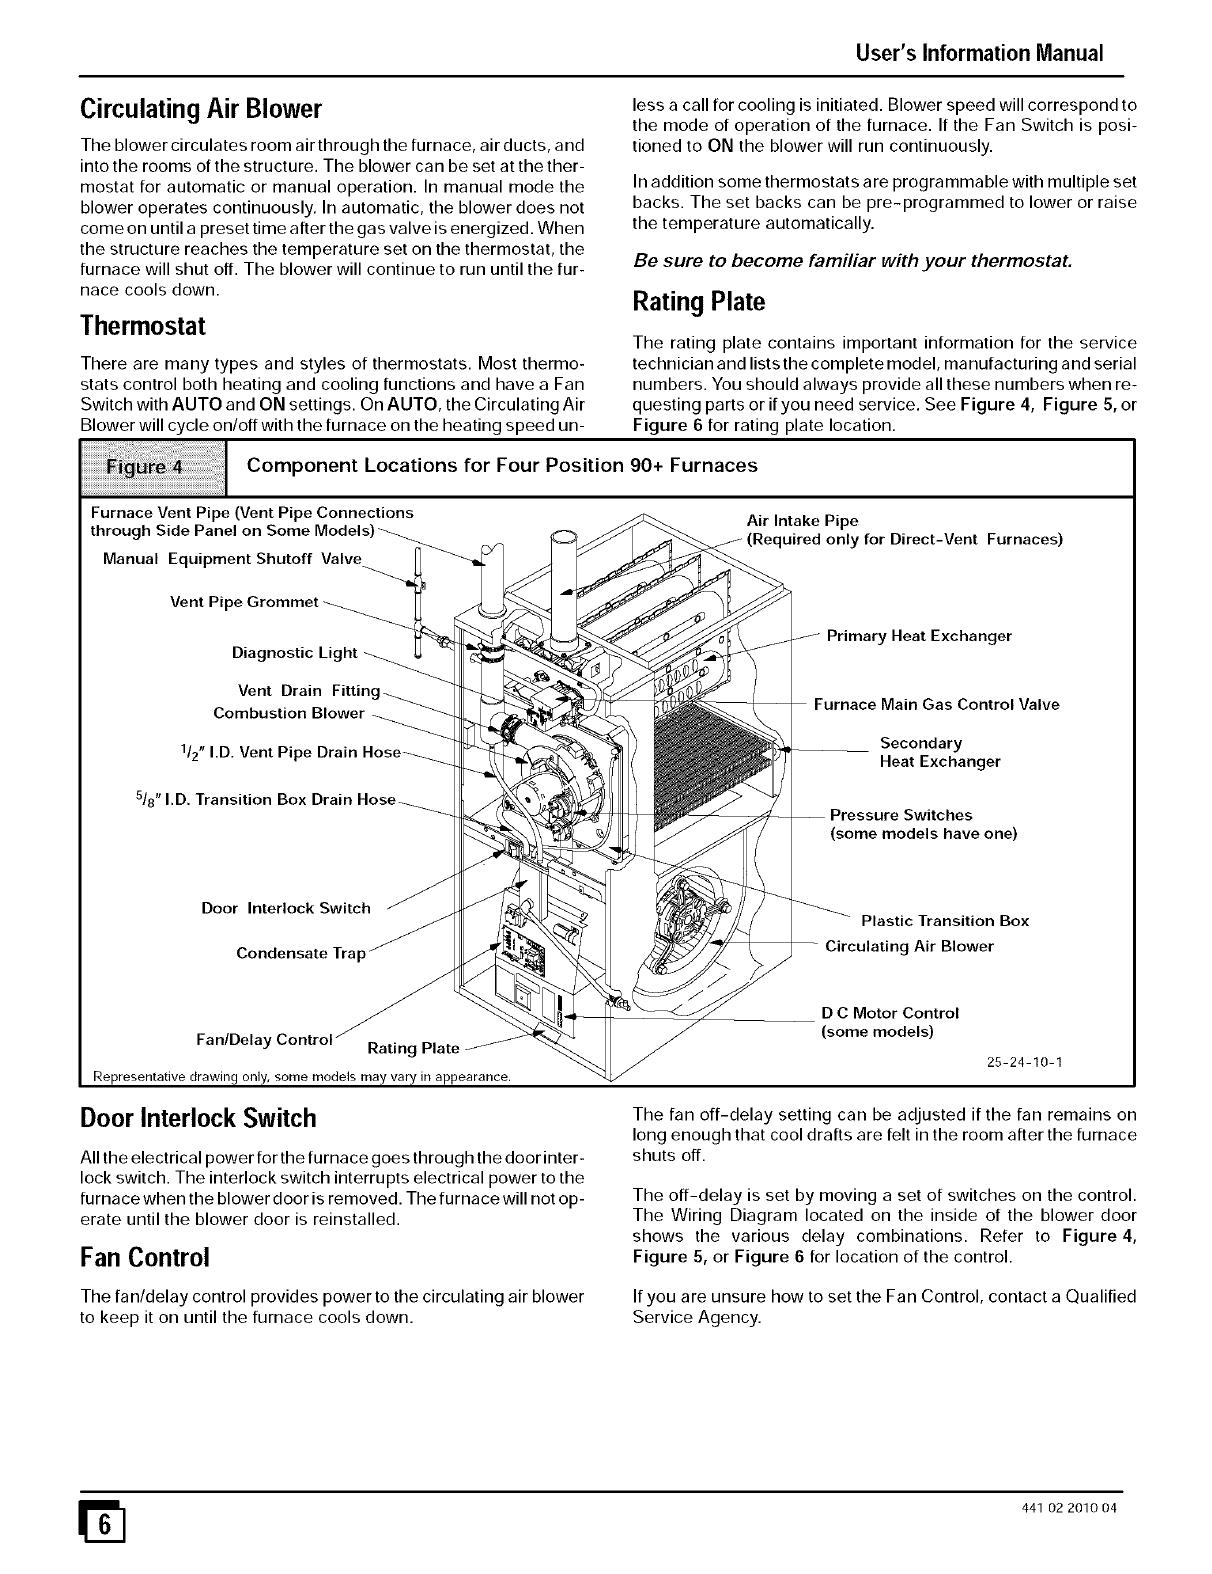 Icp Furnace Manuals Ebook 1999 Daewoo Korando Power Distribution Fuse Box Diagram Array H9mpd Manual Rh Logoutev De